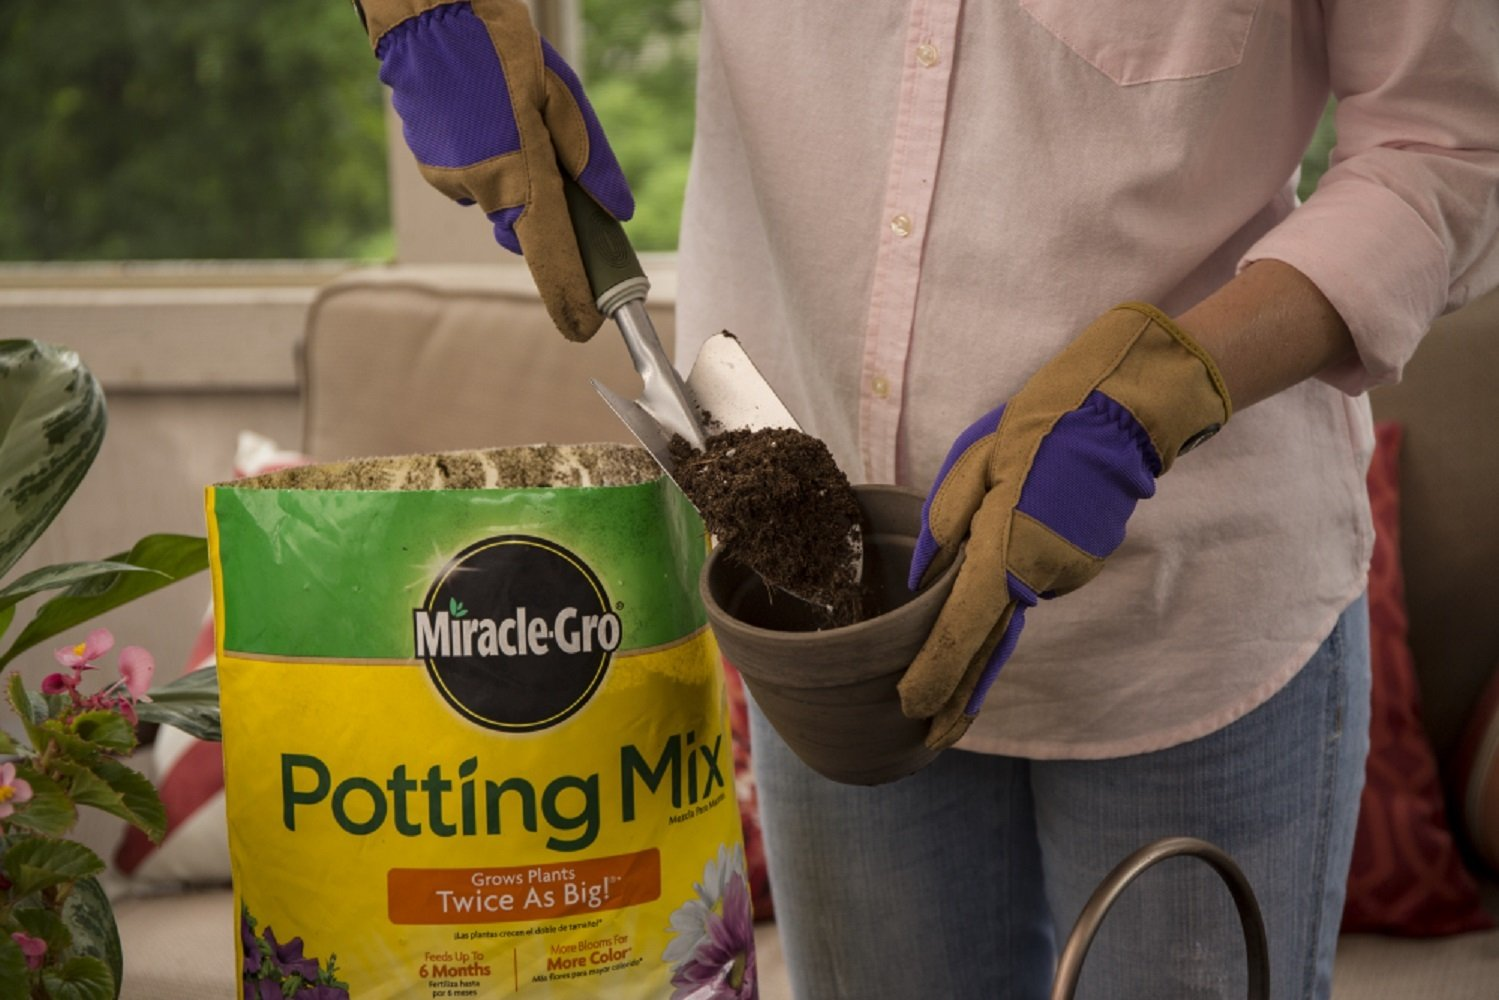 Amazon.com : Miracle-Gro Potting Mix 8 QT MGRO POTTING MIX : Garden ...